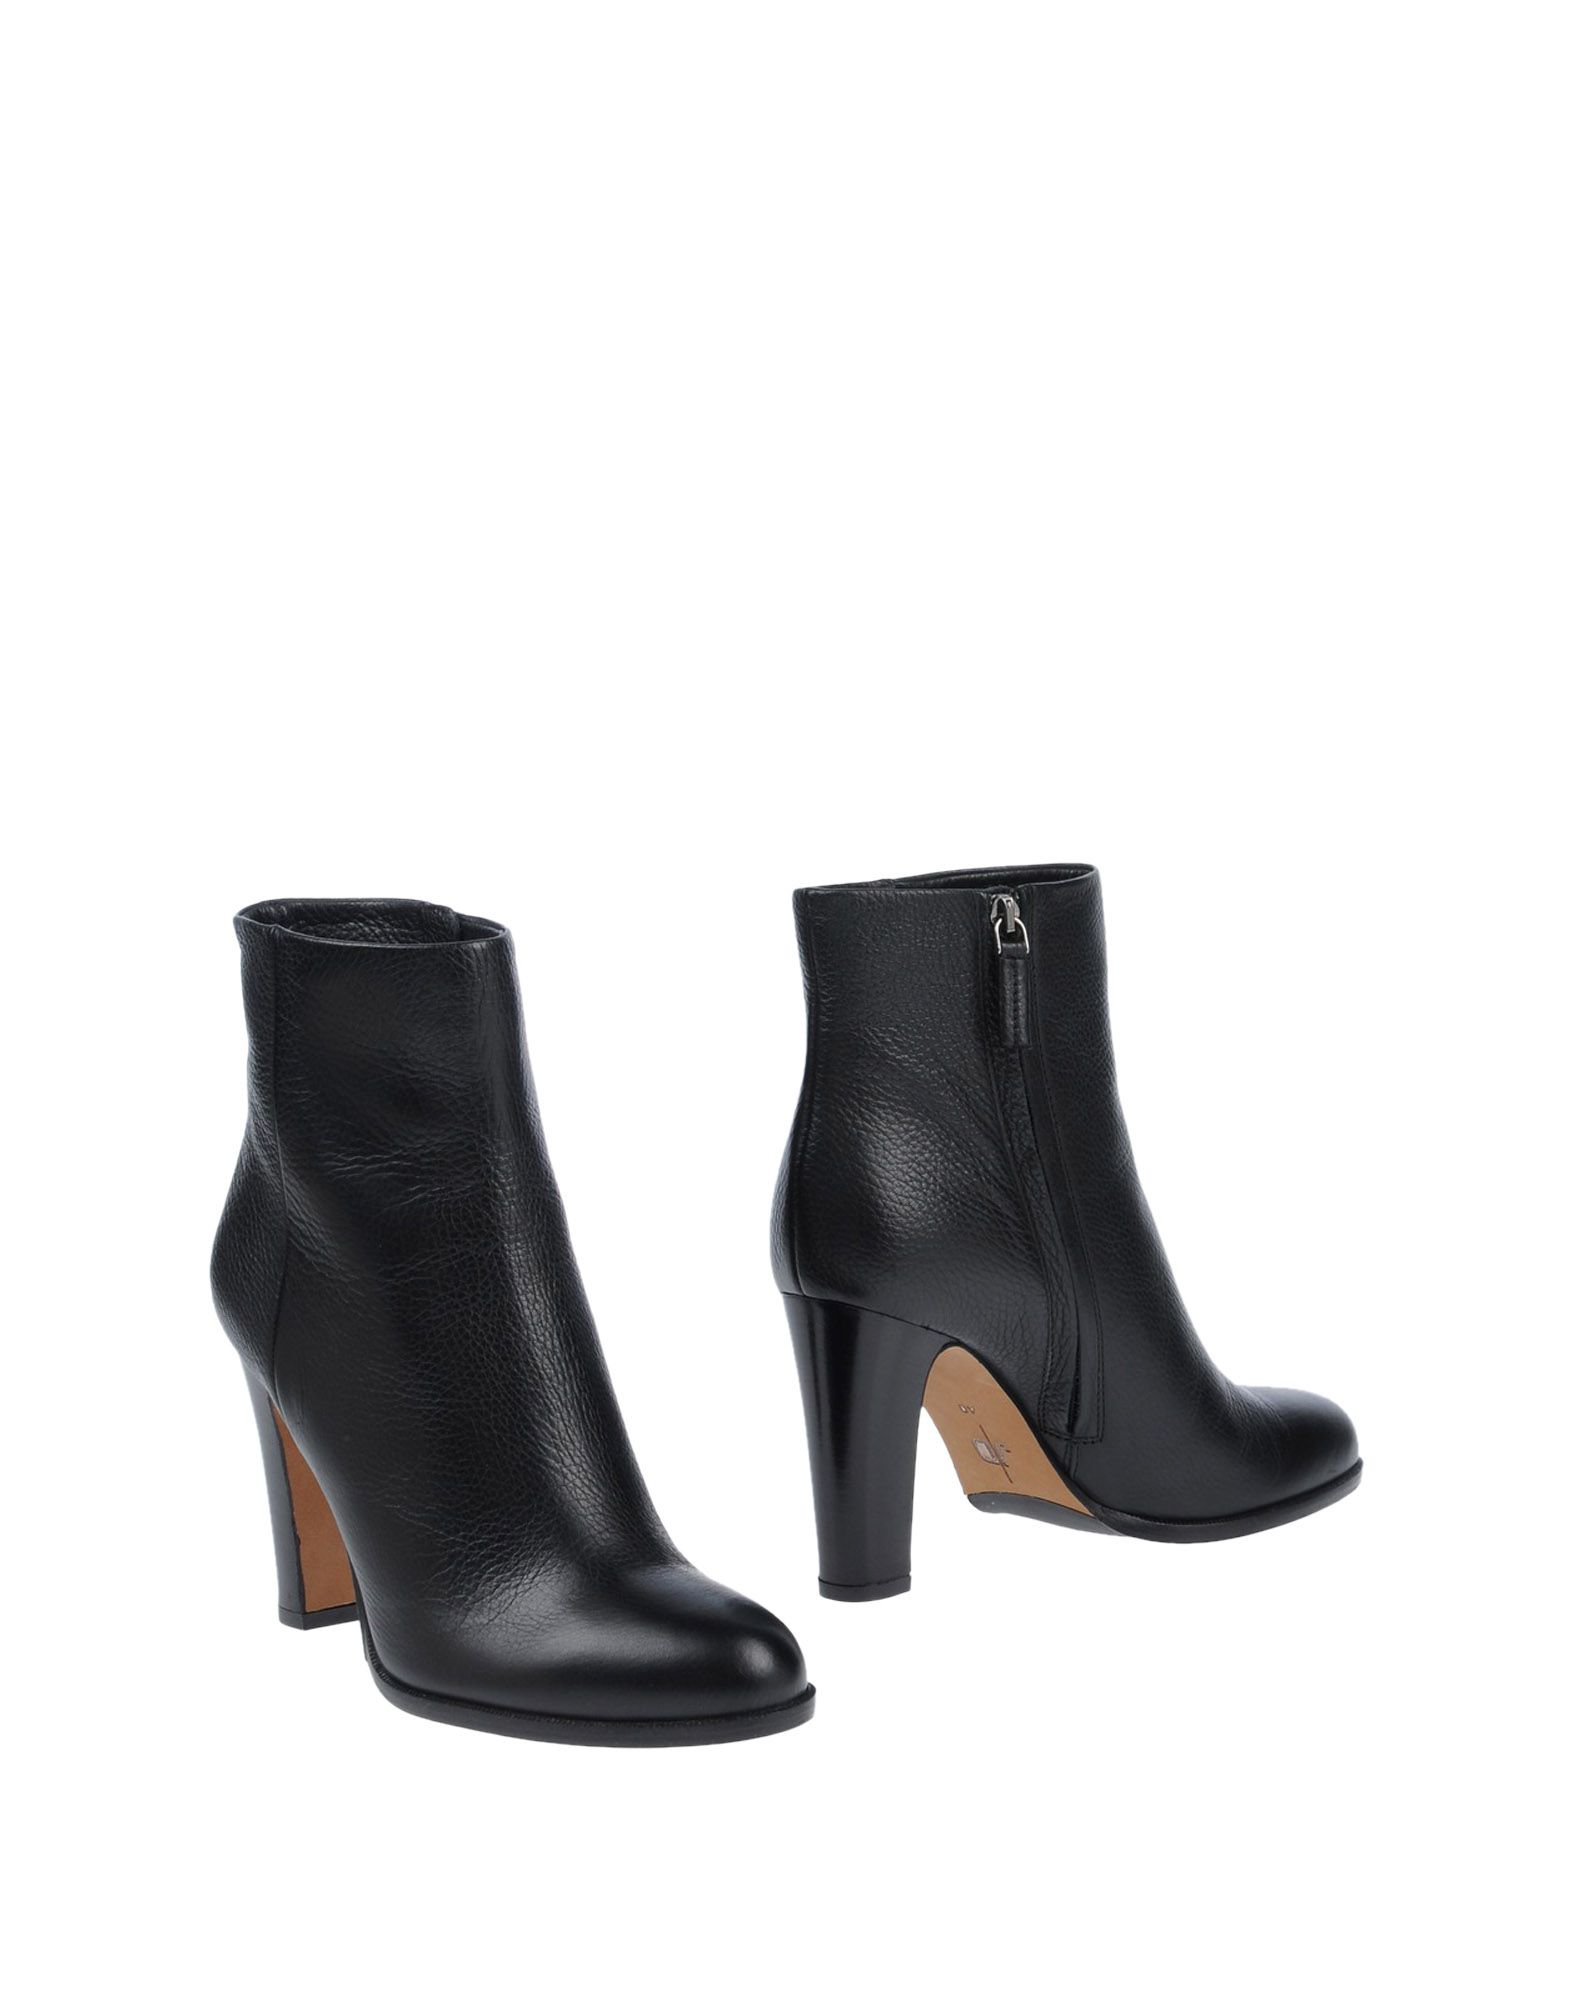 J|D - Julie Dee Ankle Boot - J|D Women J|D Julie Dee Ankle Boots online on  United Kingdom - 11501663SI 484a1a